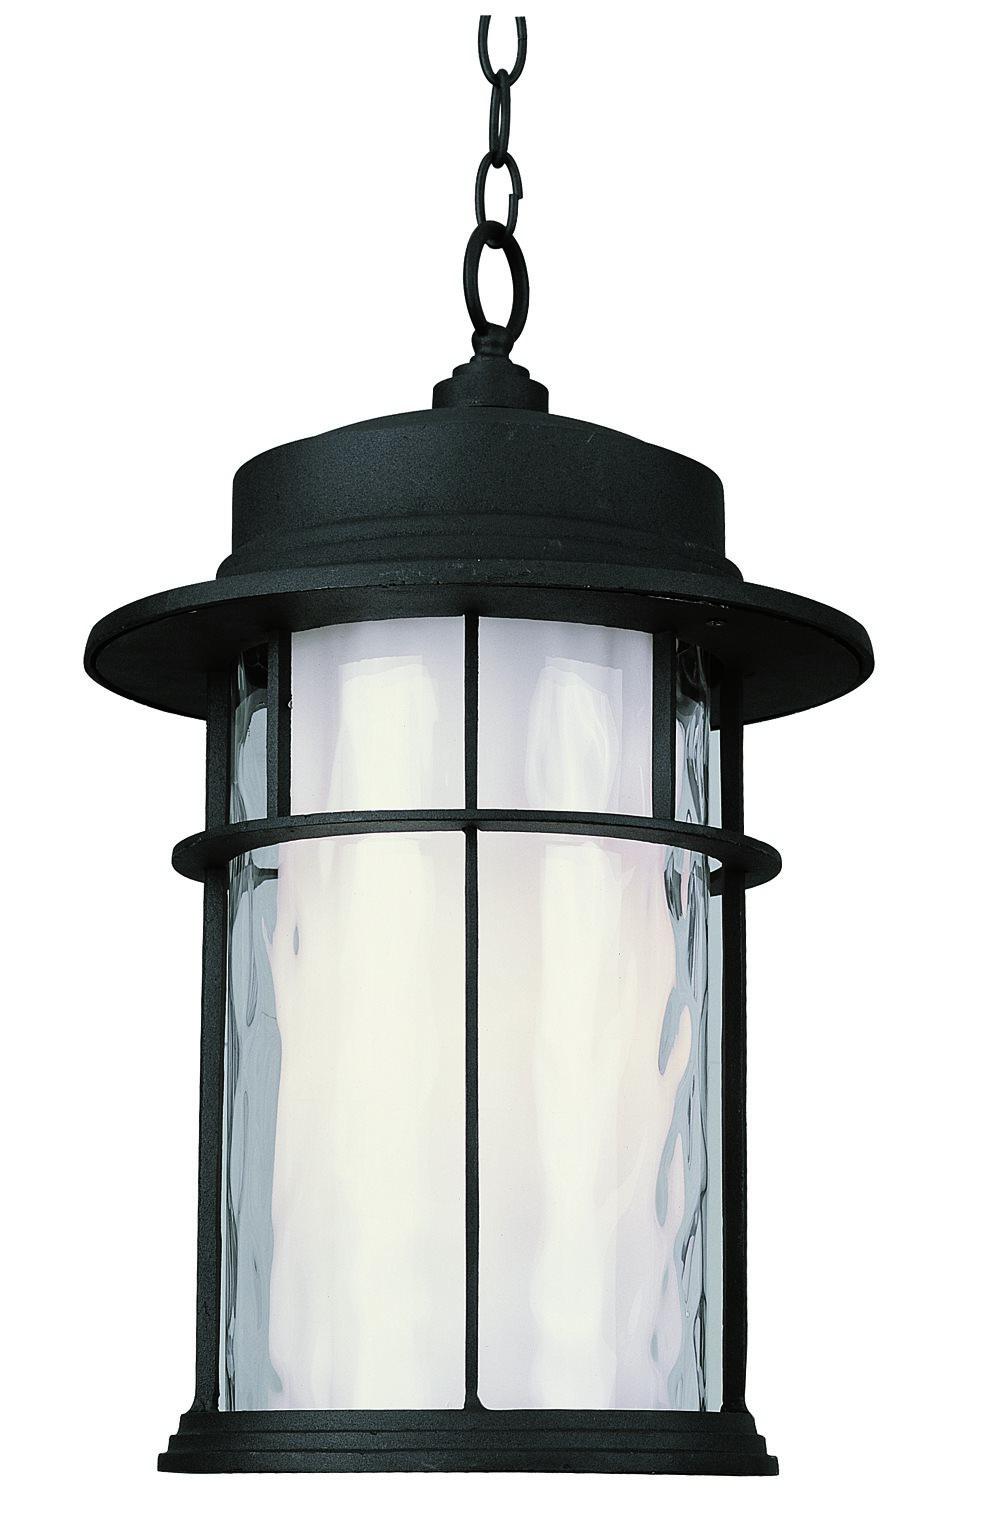 Trans Globe Lighting 5295 BK Craftsman Transitional